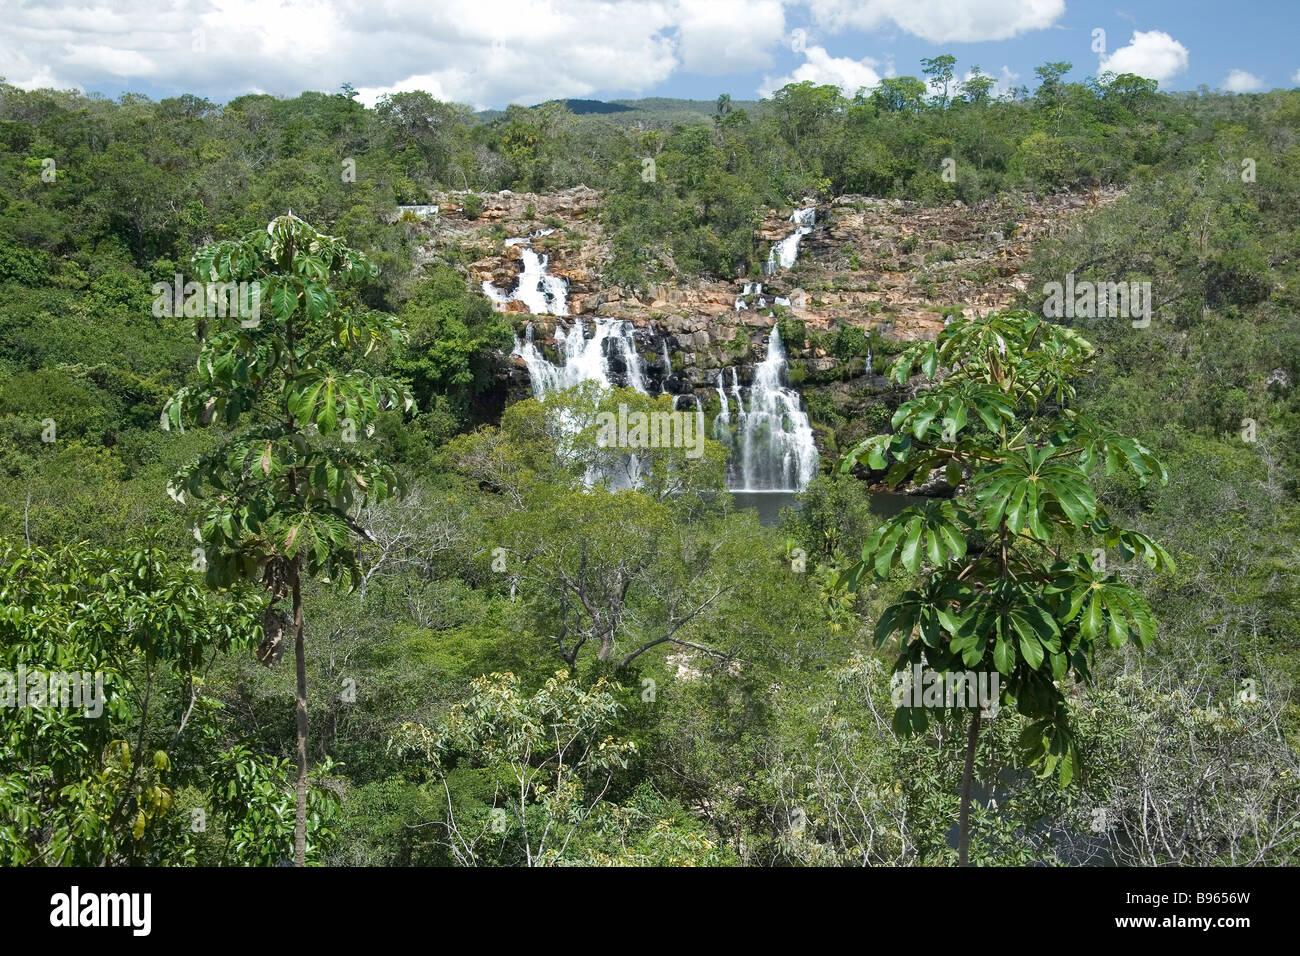 Cachoeira do Poço Encantado, Enchanted Pond Waterfall, Chapada dos Veadeiros, Veadeiros Tableland, Goias, Brazil Stock Photo